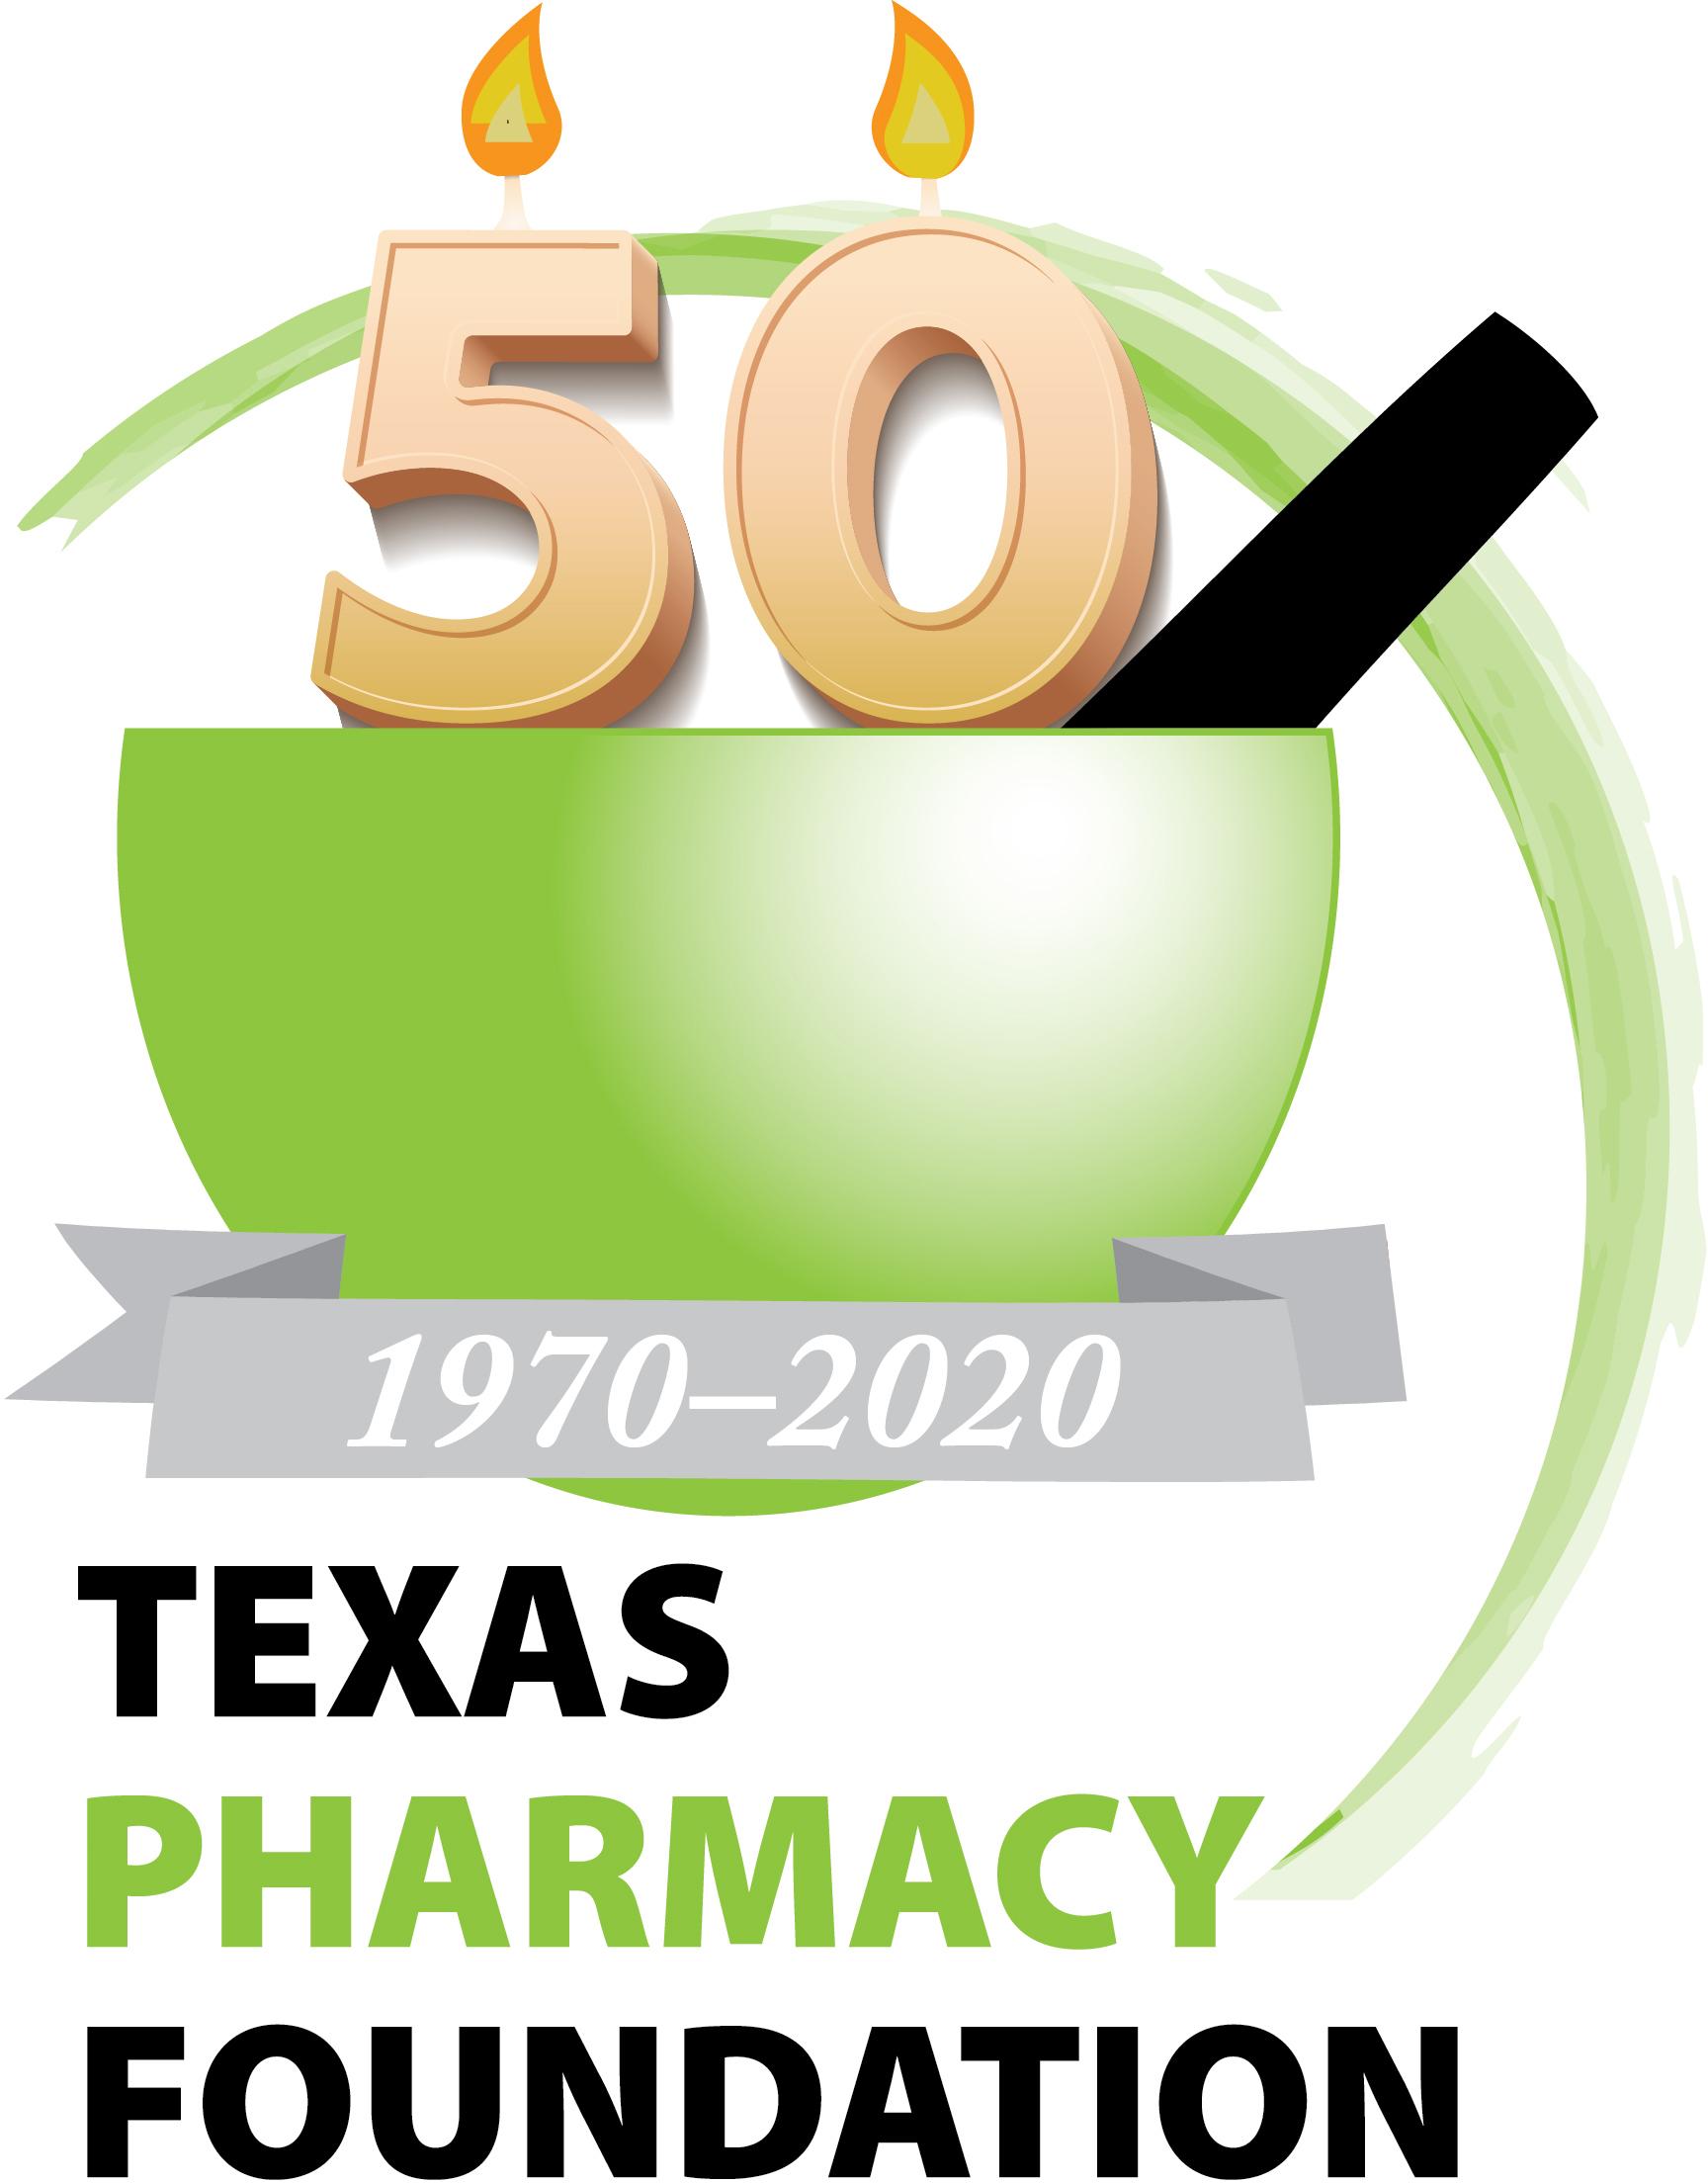 Texas Pharmacy Foundation: $50K for 50 Years